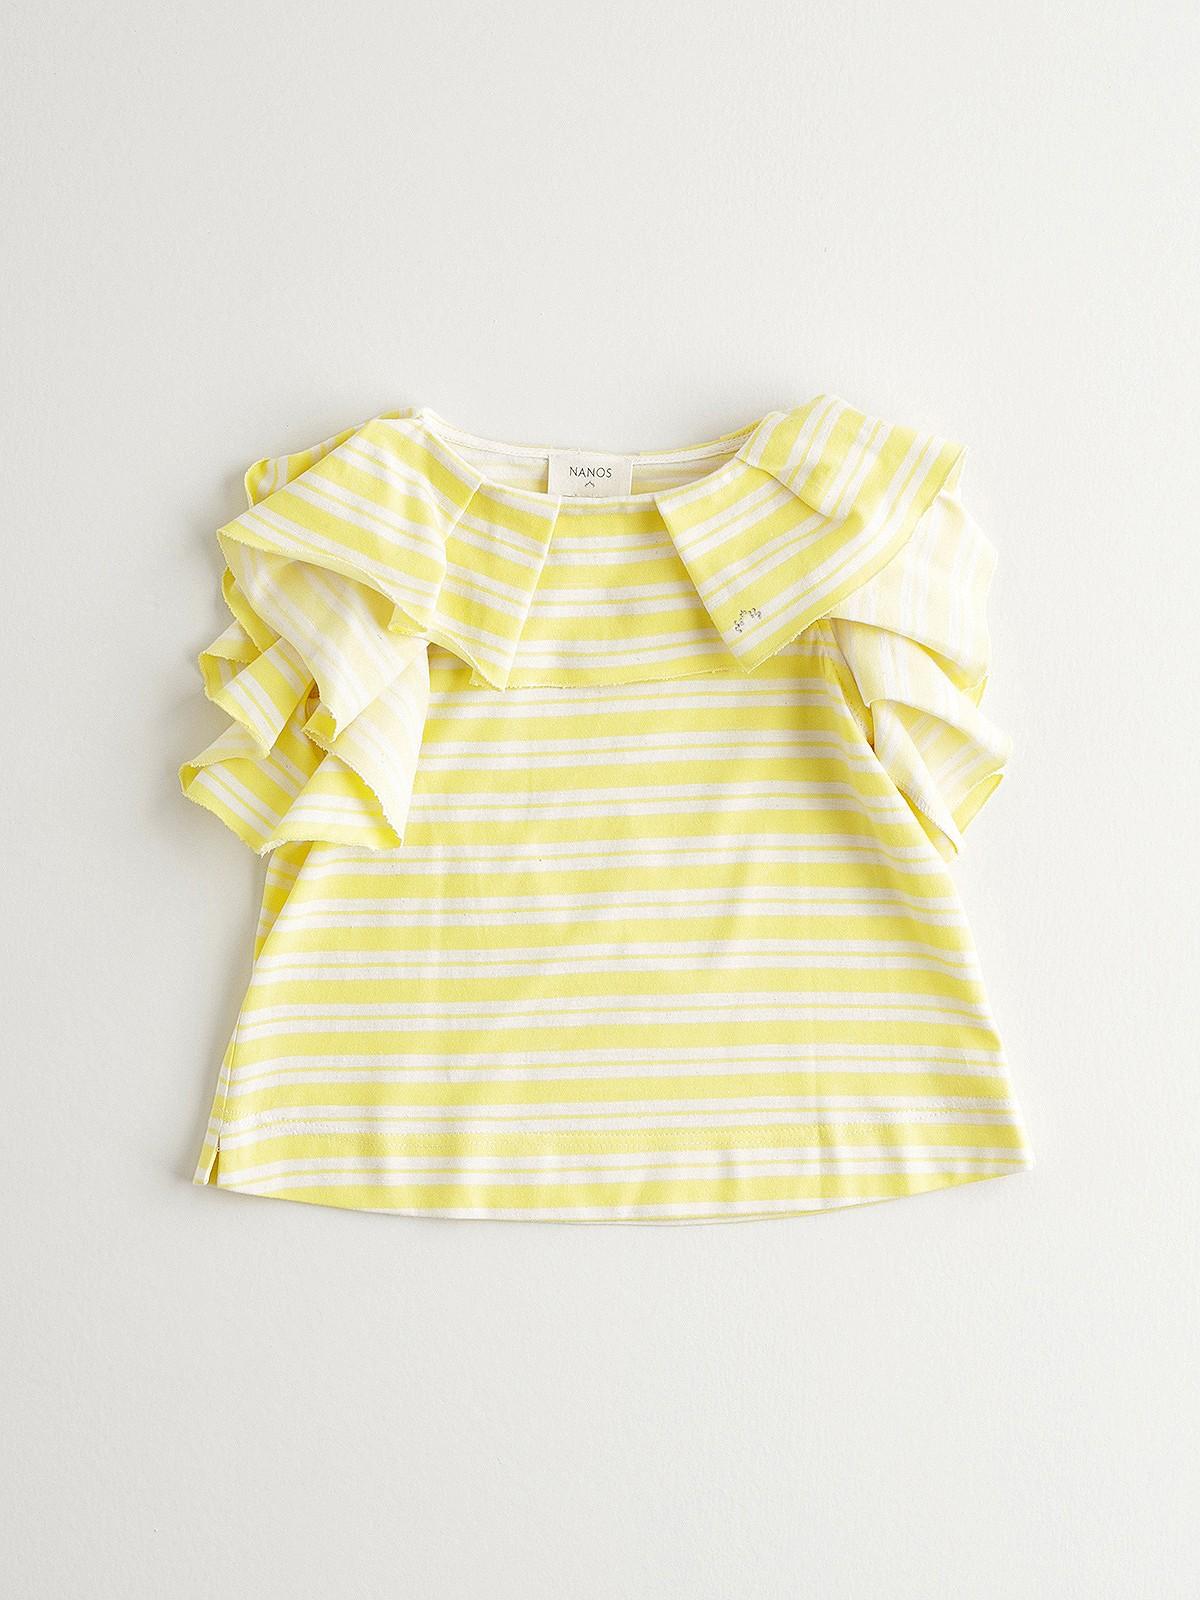 NANOS 黃色條紋上衣